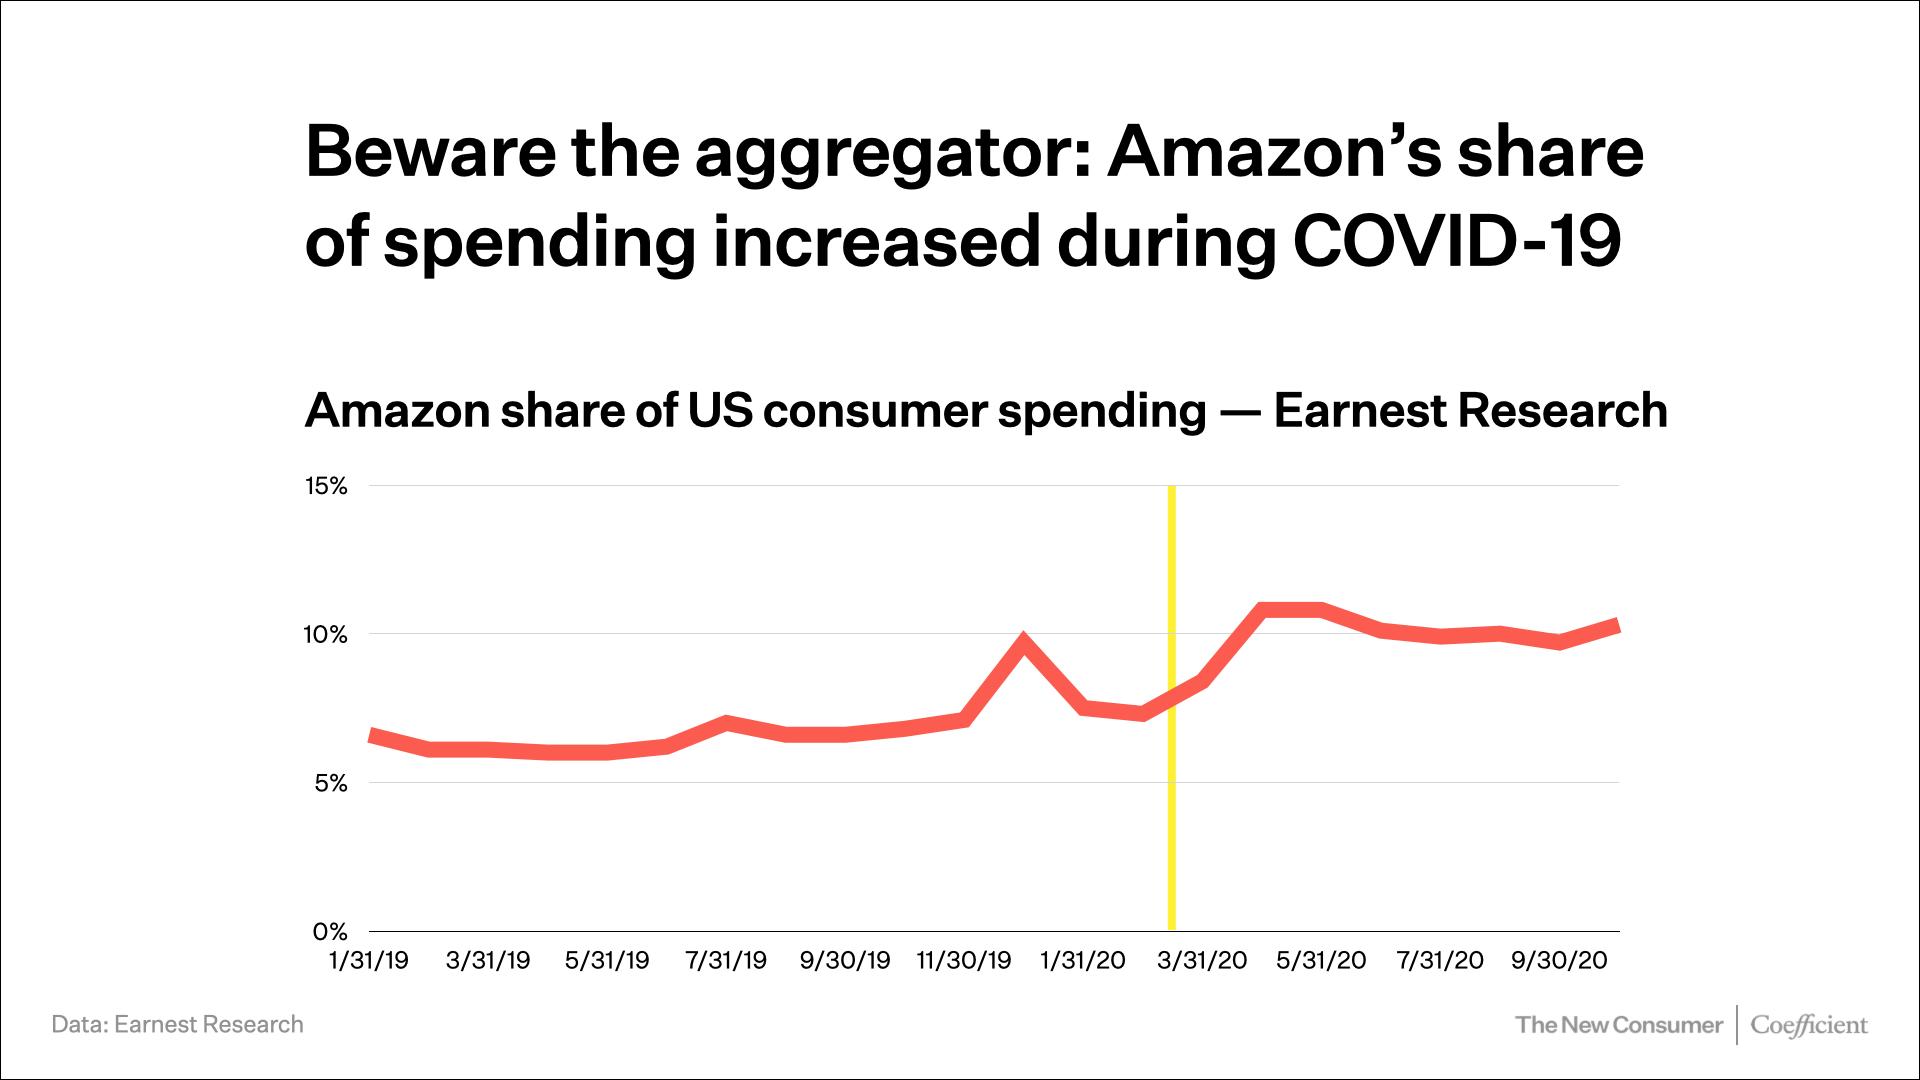 Amazon percentage of consumer spending